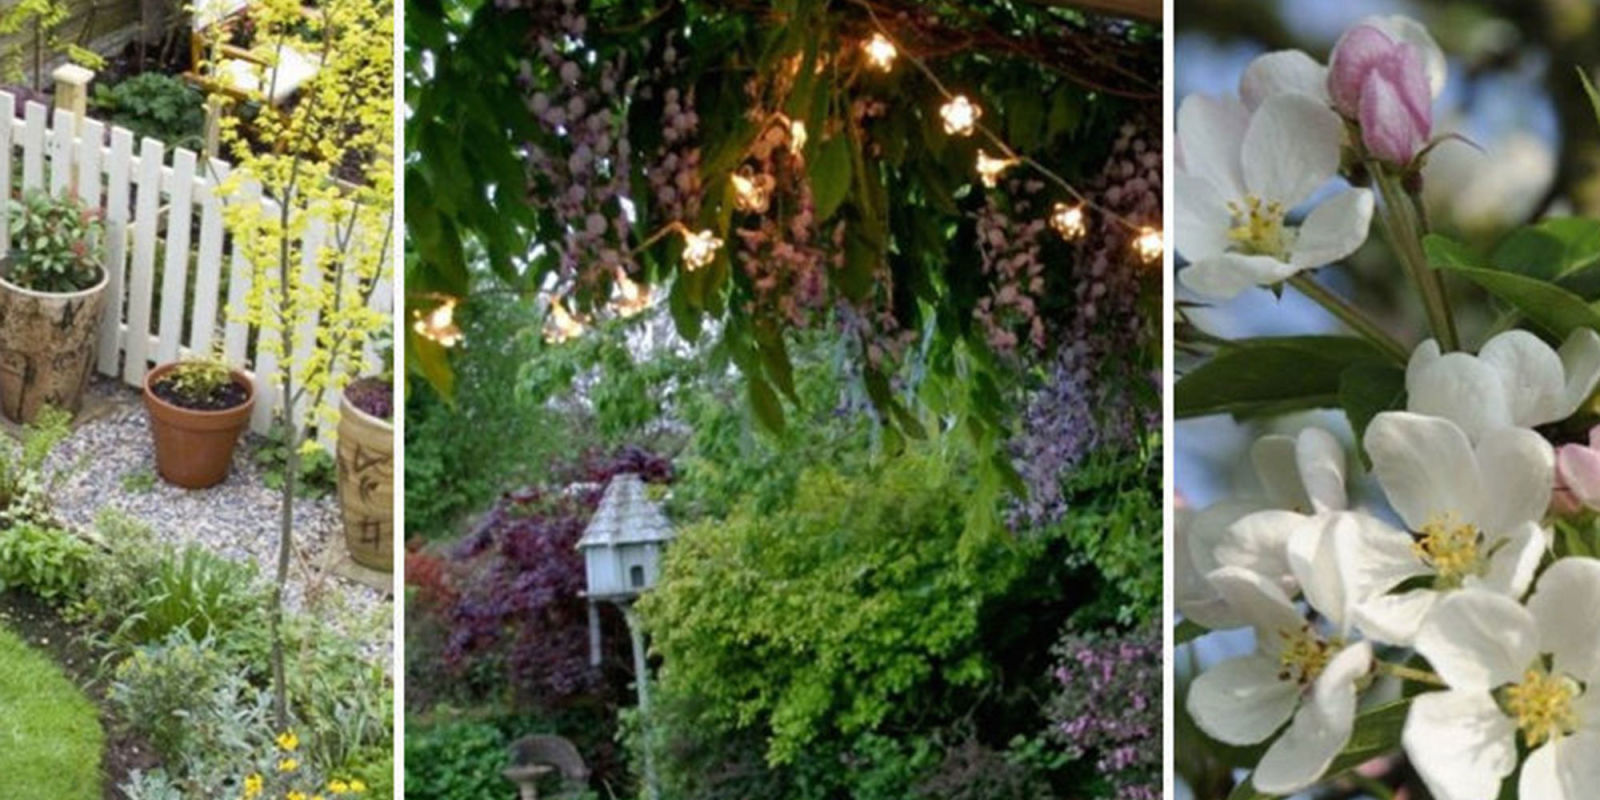 garden ideas on a budget. Black Bedroom Furniture Sets. Home Design Ideas